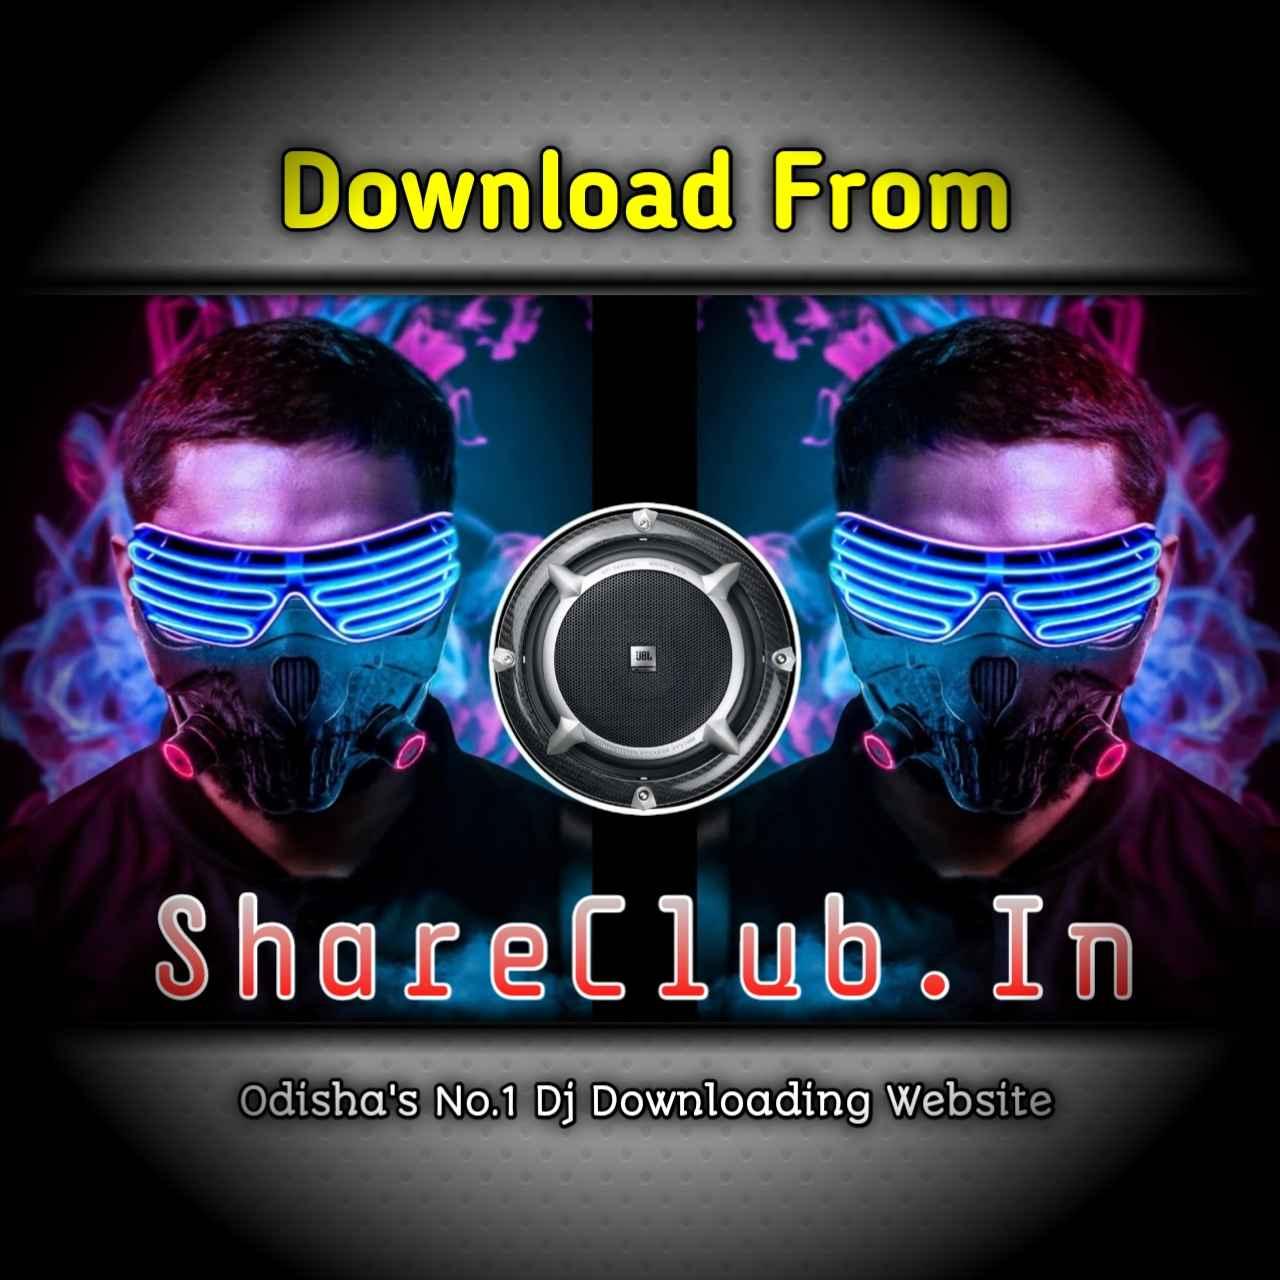 Pubg Vs freefire (Sbp Cg Tapori Mix) Dj Ashish Nd Dj Vicky